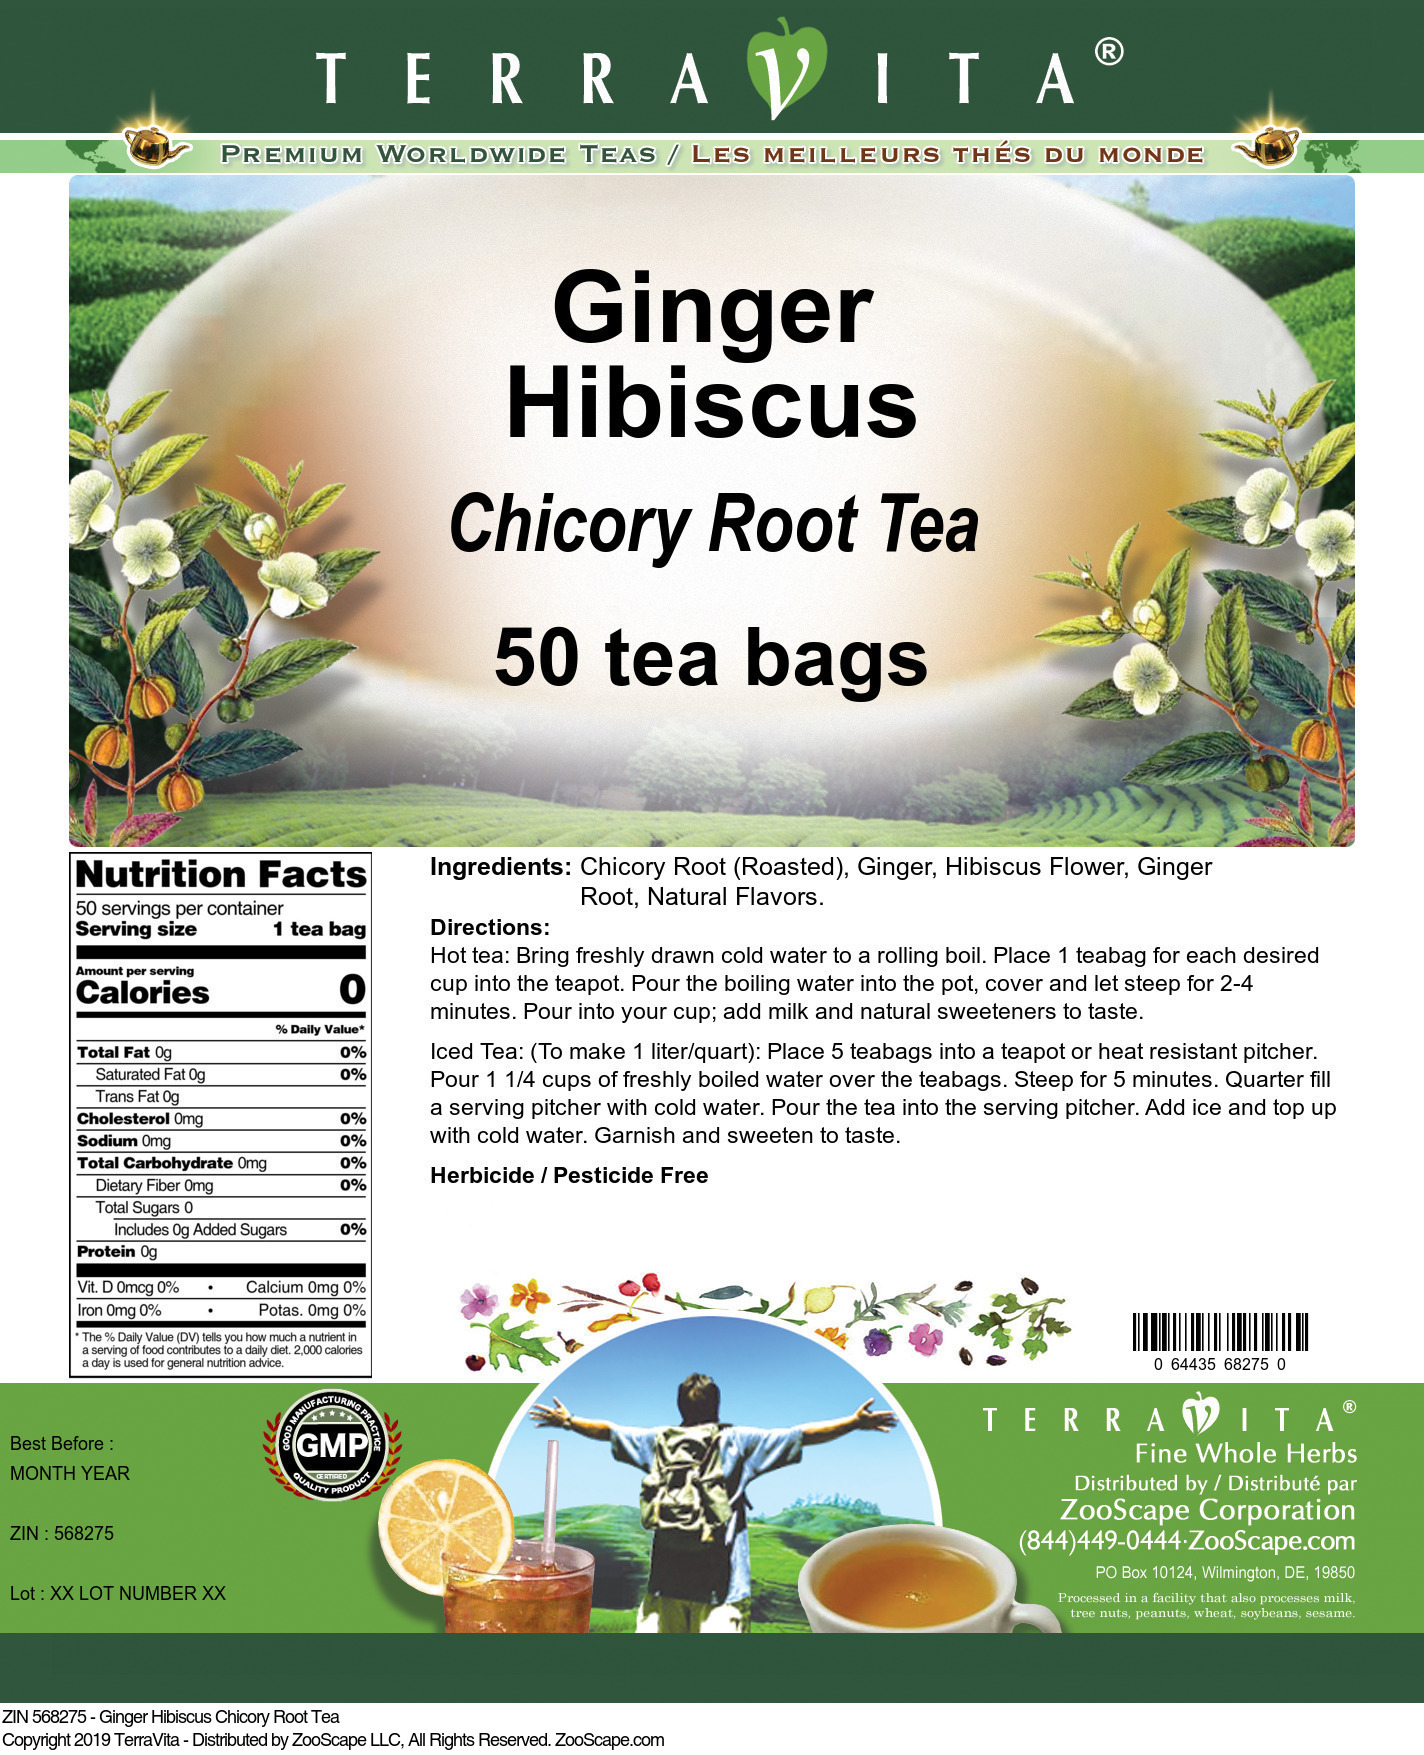 Ginger Hibiscus Chicory Root Tea